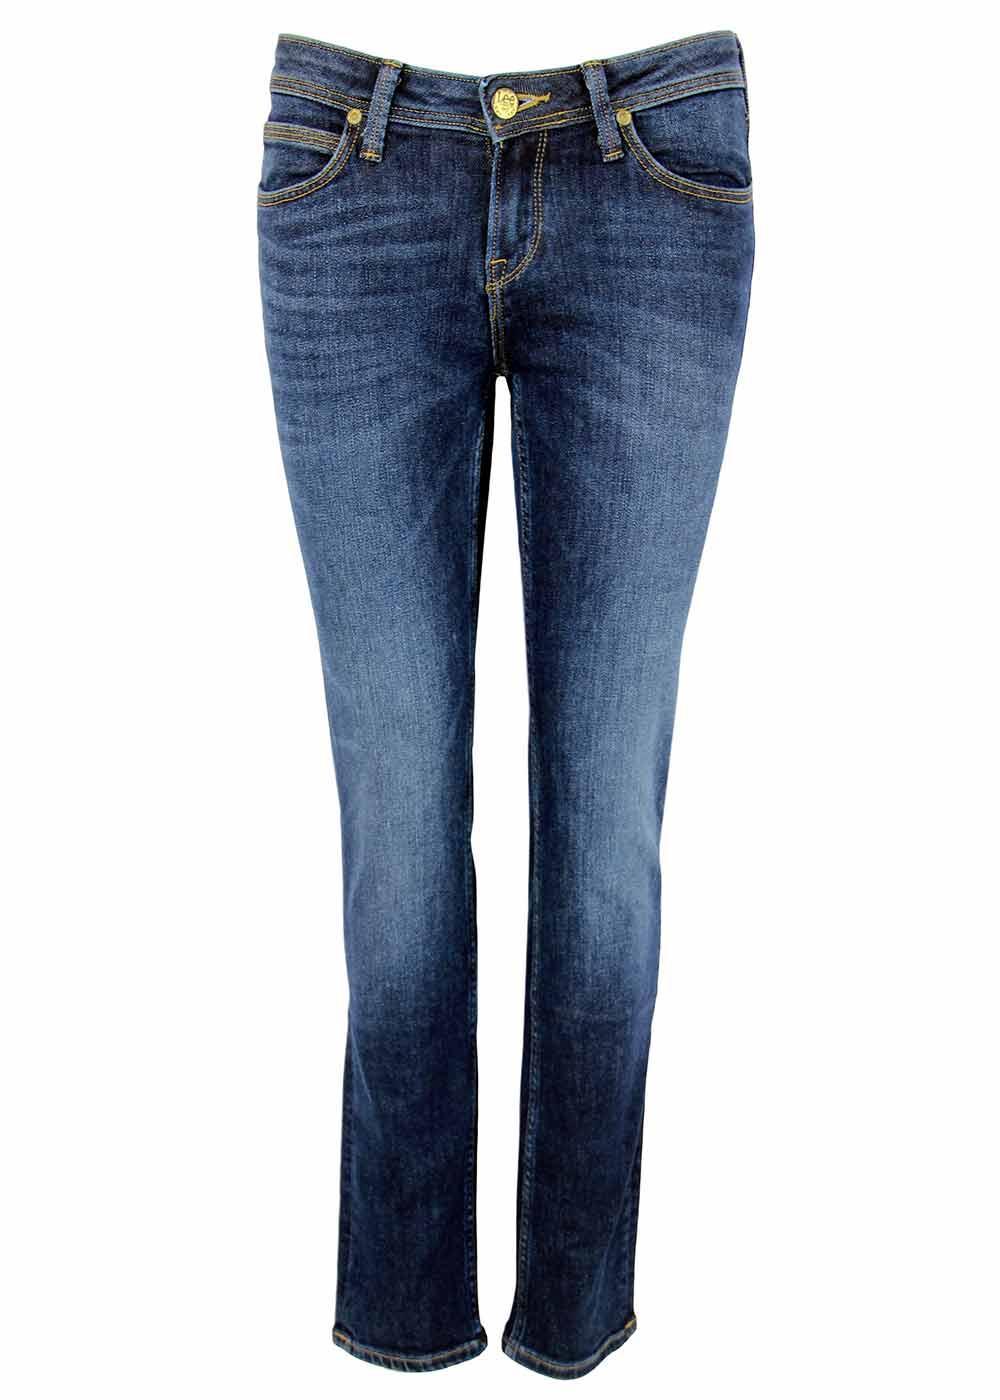 emlyn lee retro indie straight tapered fit denim jeans blue notes. Black Bedroom Furniture Sets. Home Design Ideas